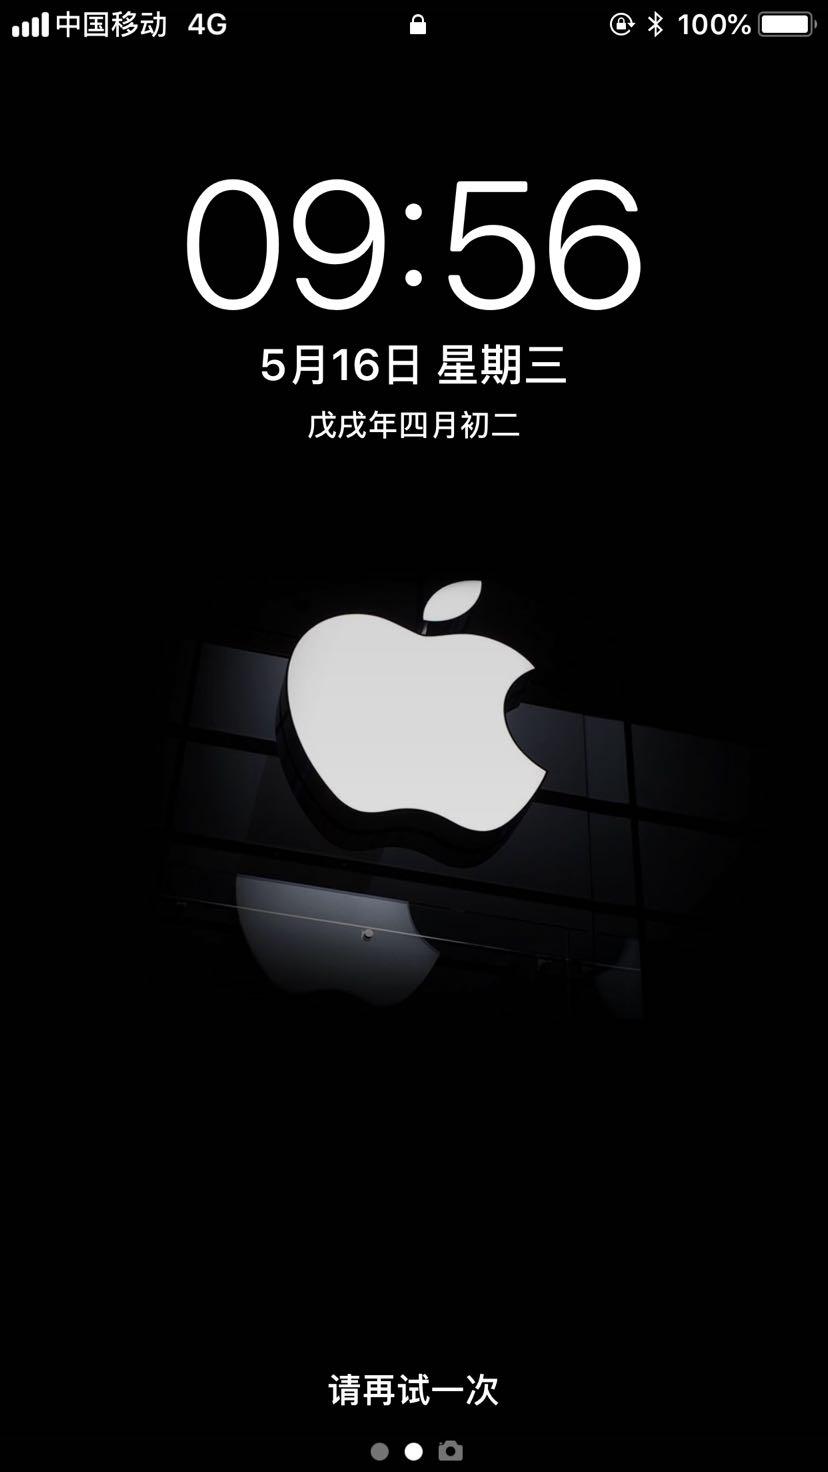 7plus软件/亮黑色128gbv软件联通主题4g手机通全网电信国行手机苹果6黑色正品苹果图片